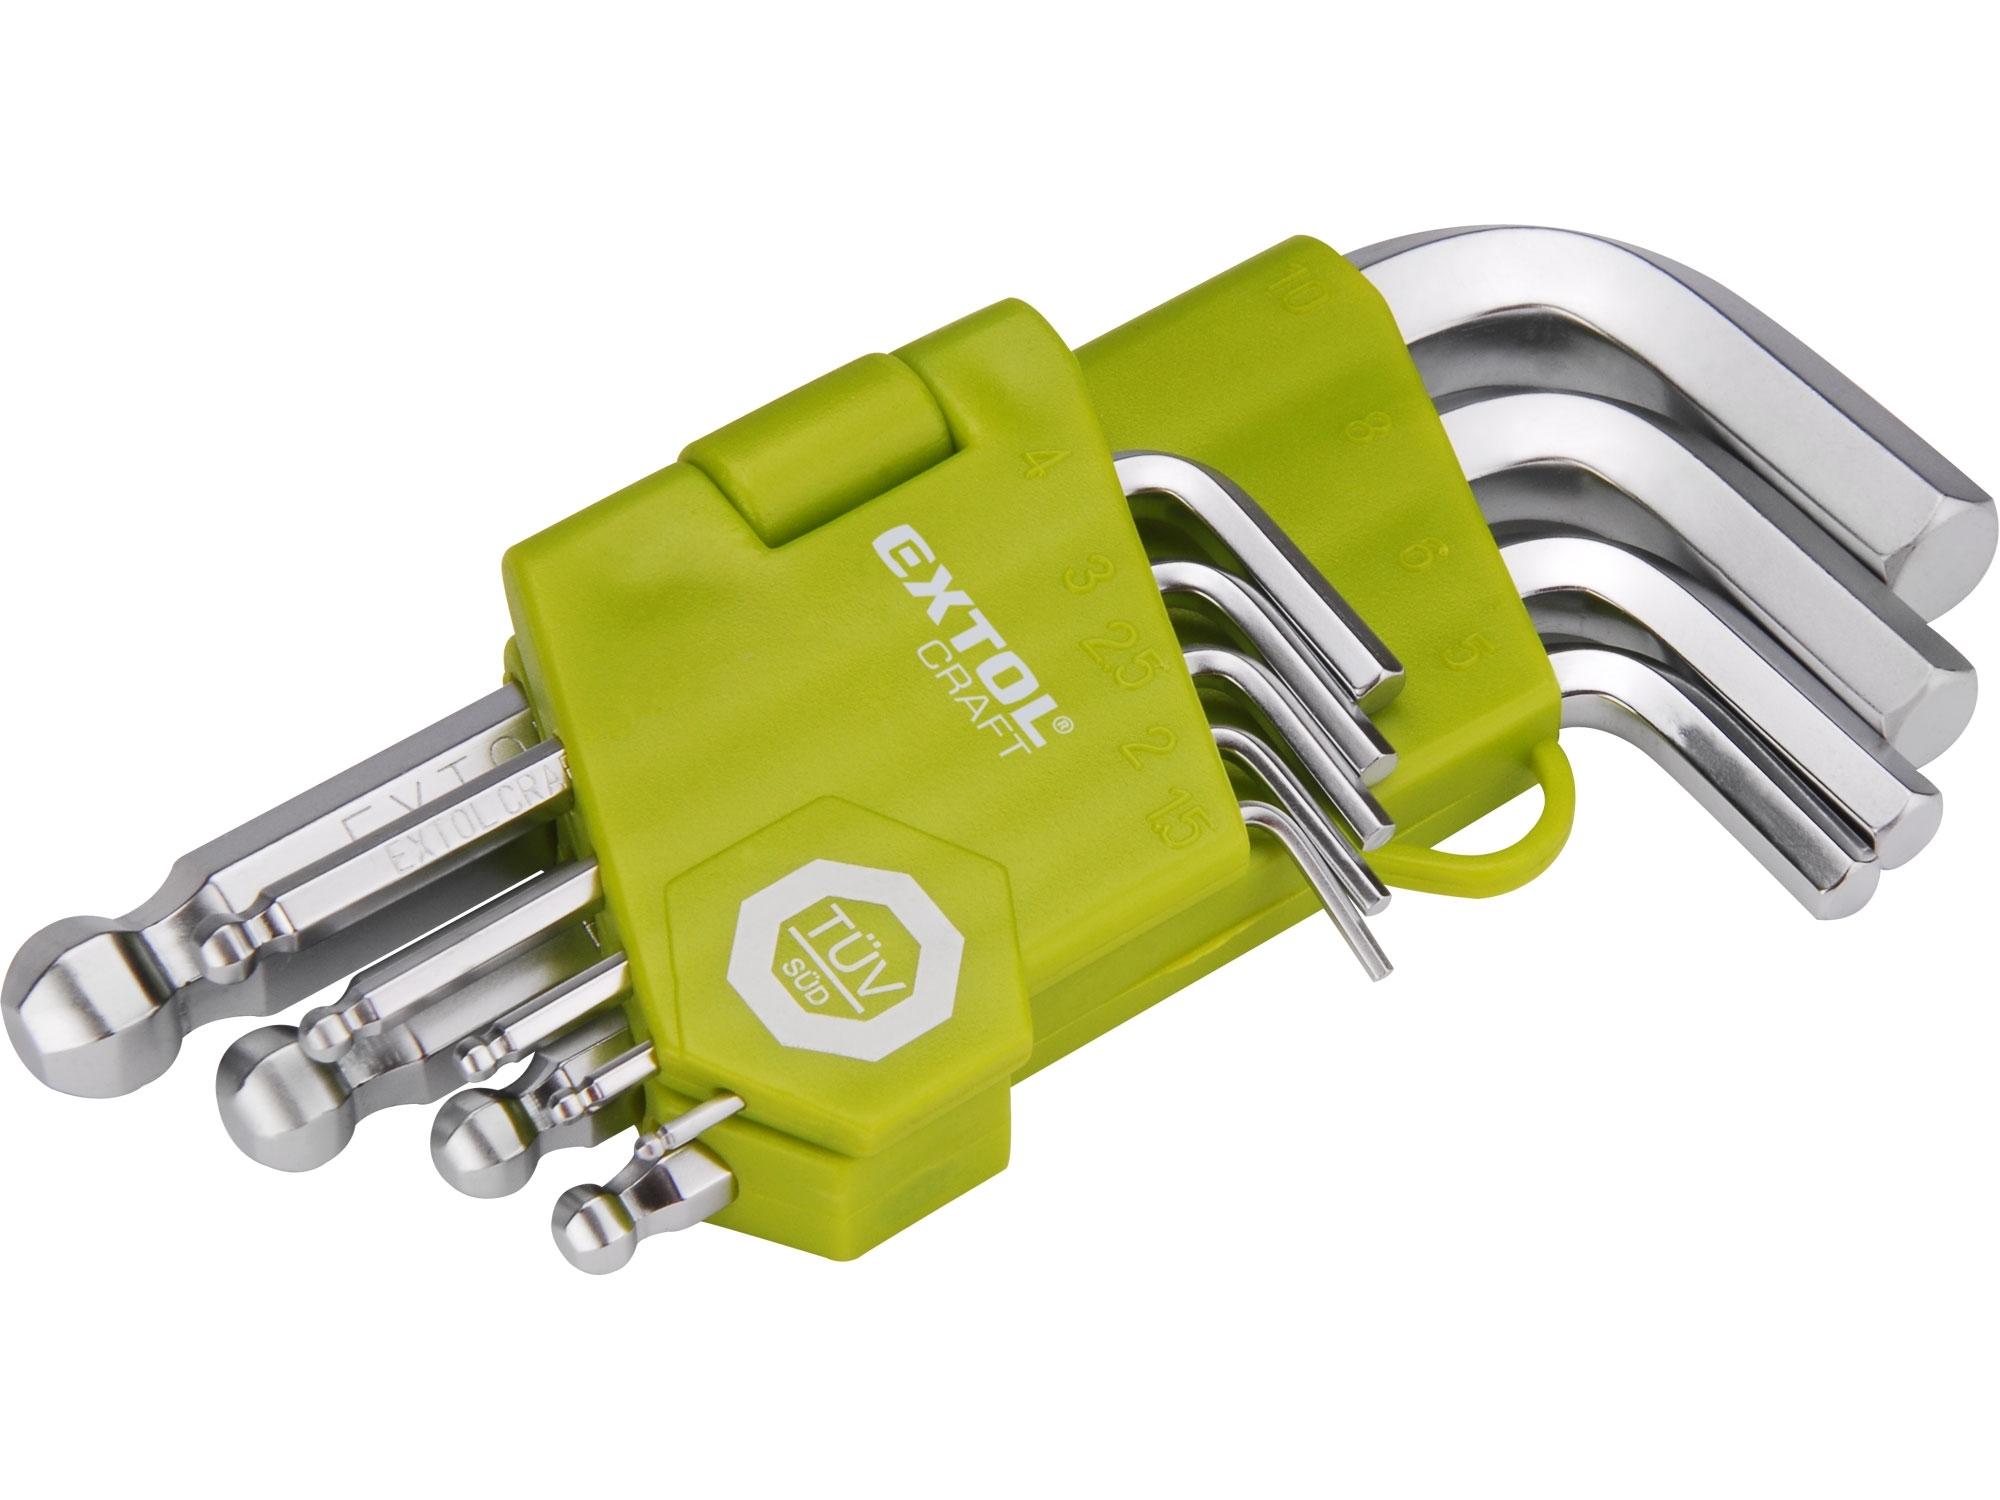 L-klíče IMBUS krátké, sada 9ks, H1,5-10mm, EXTOL CRAFT 66000